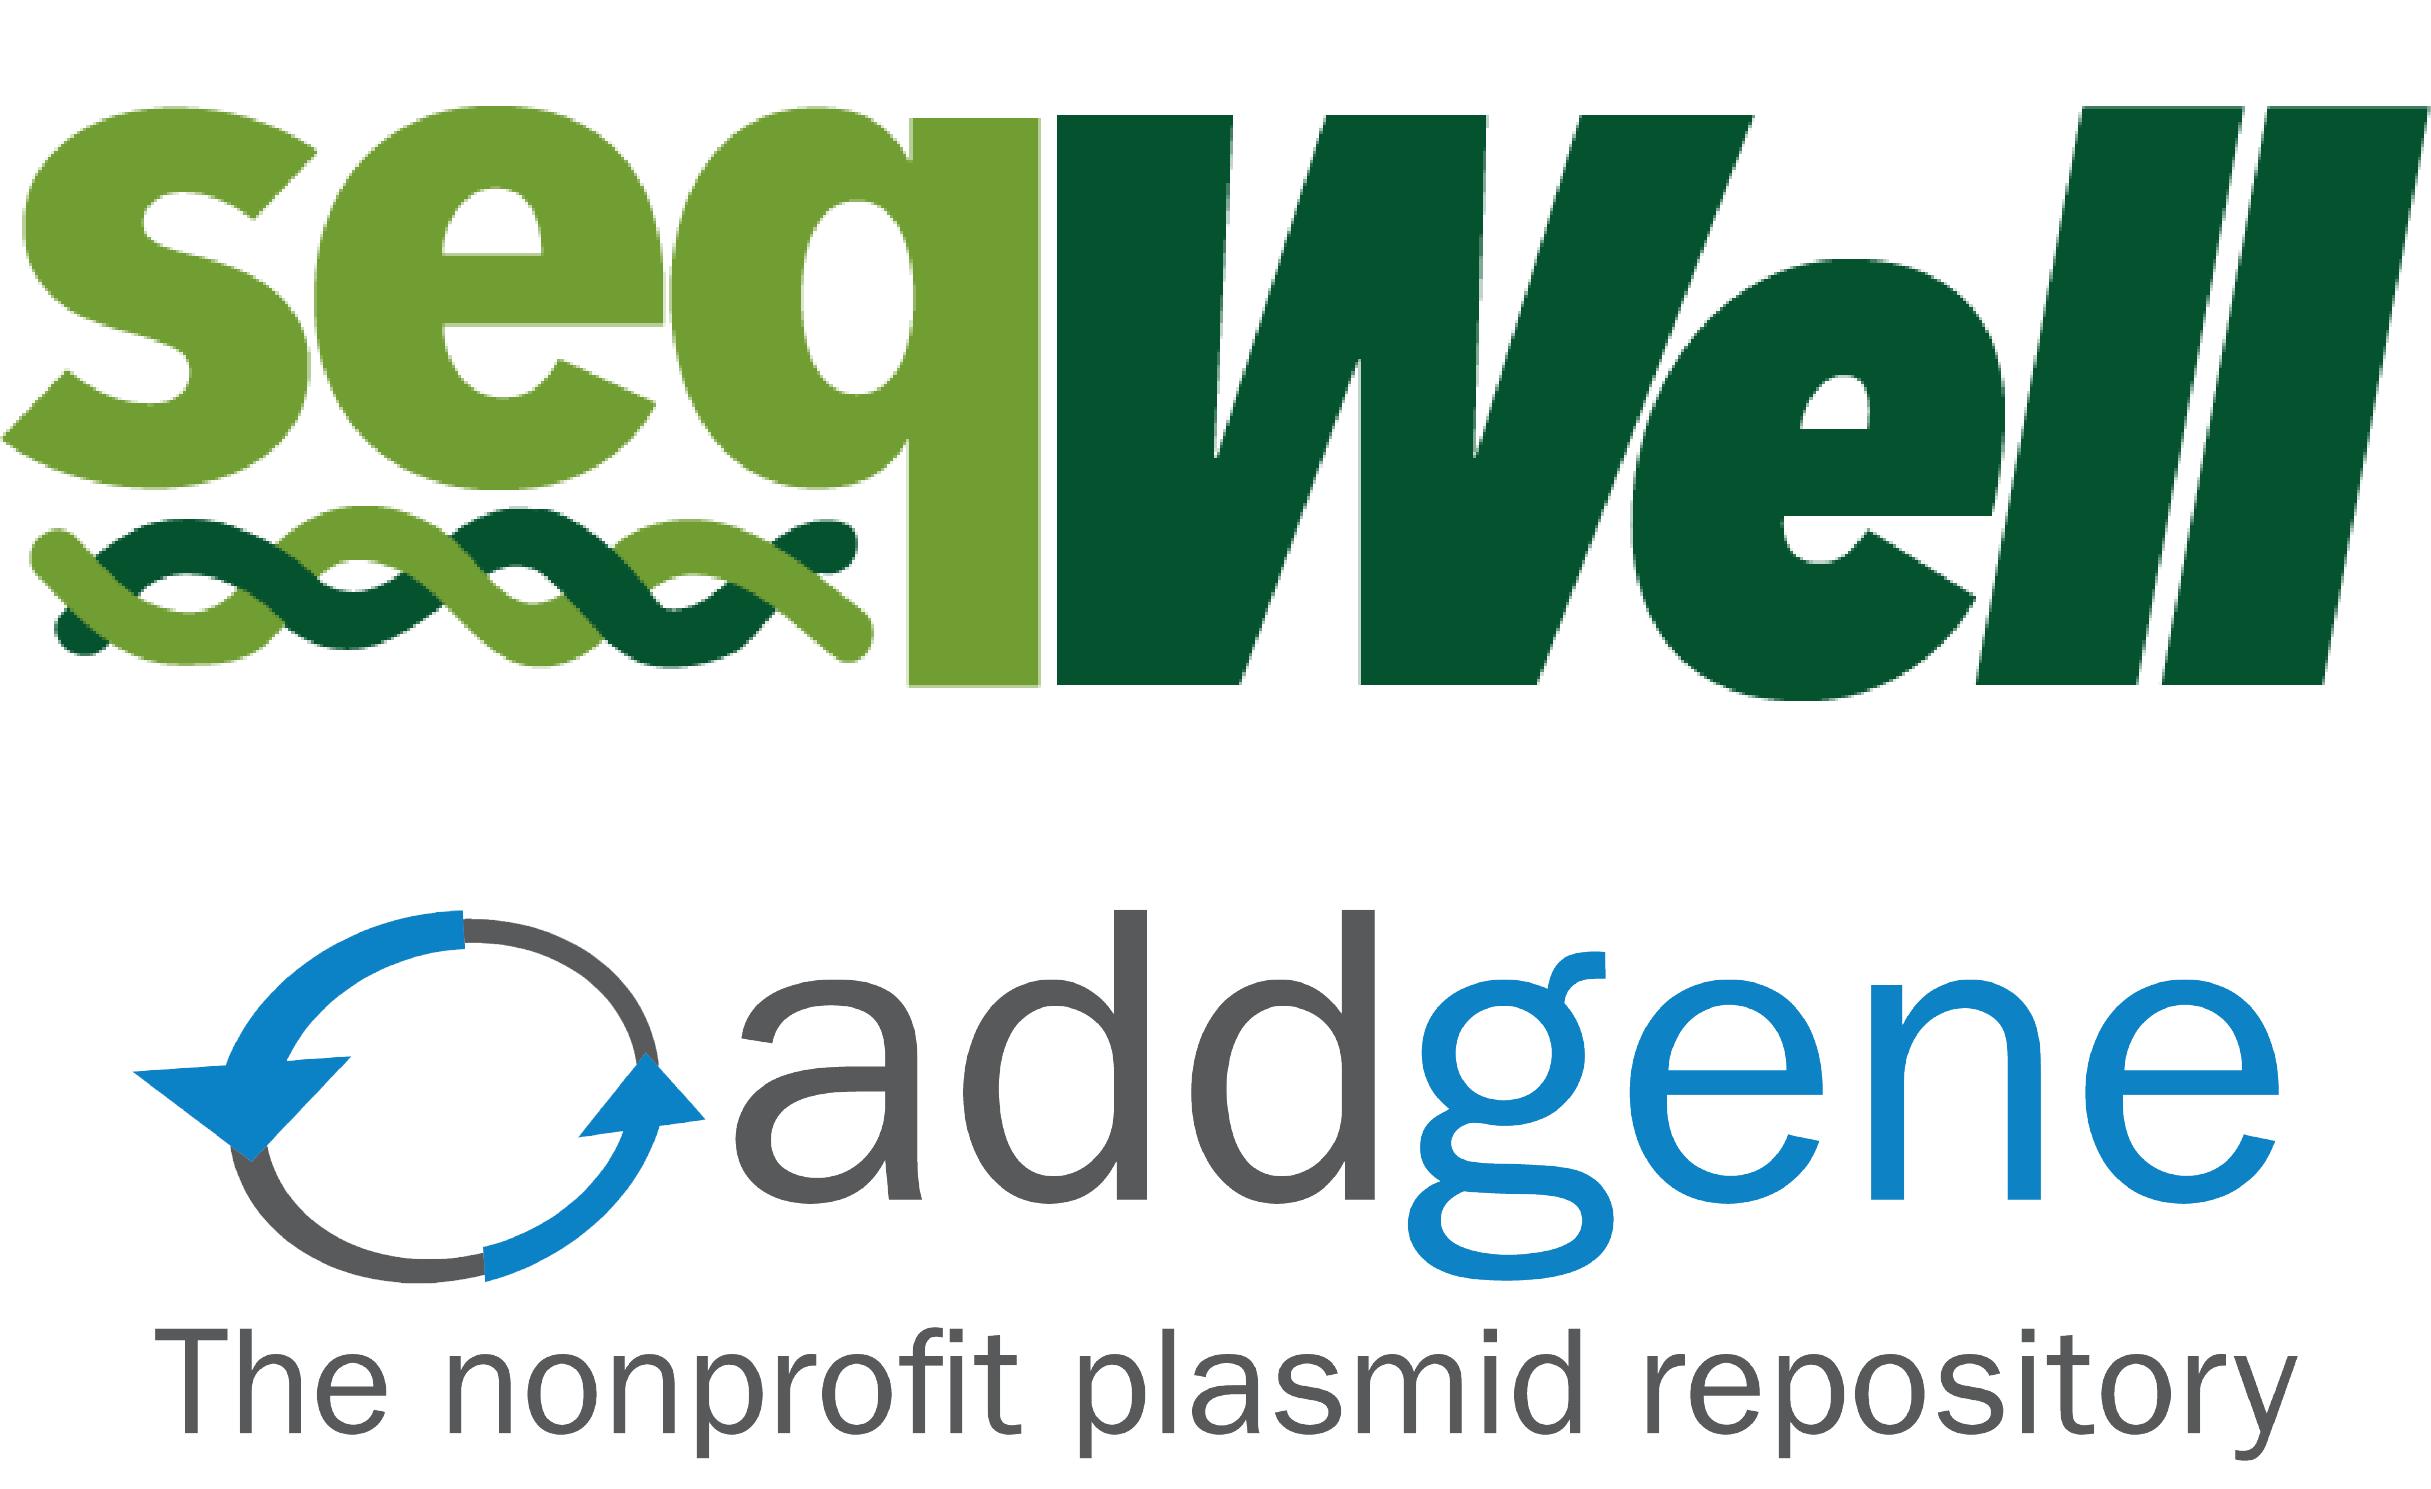 seqWell Addgene Logos-01.png